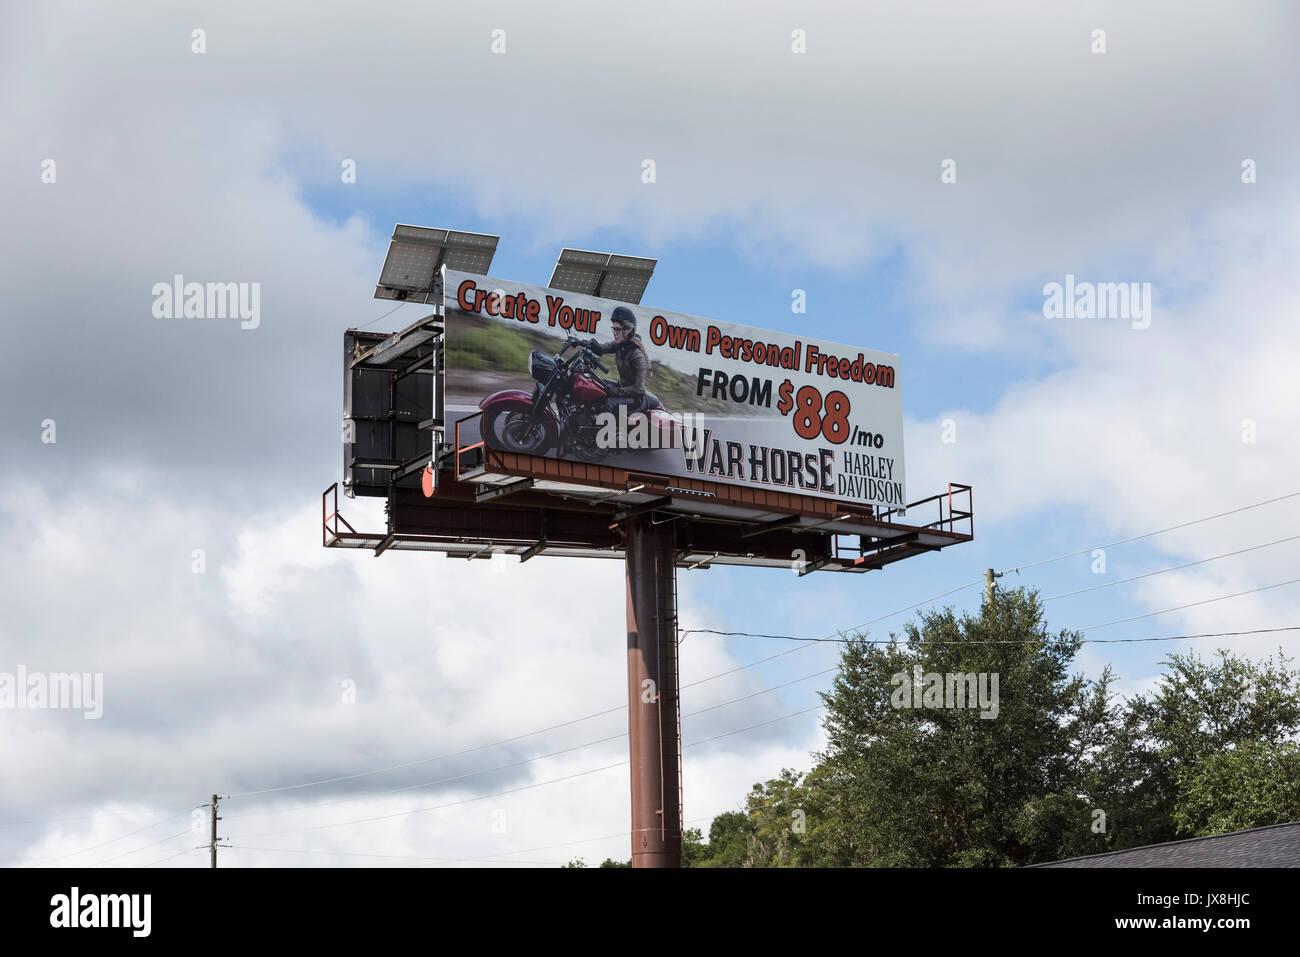 billboard at warhorse harley davidson in ocala, florida stock